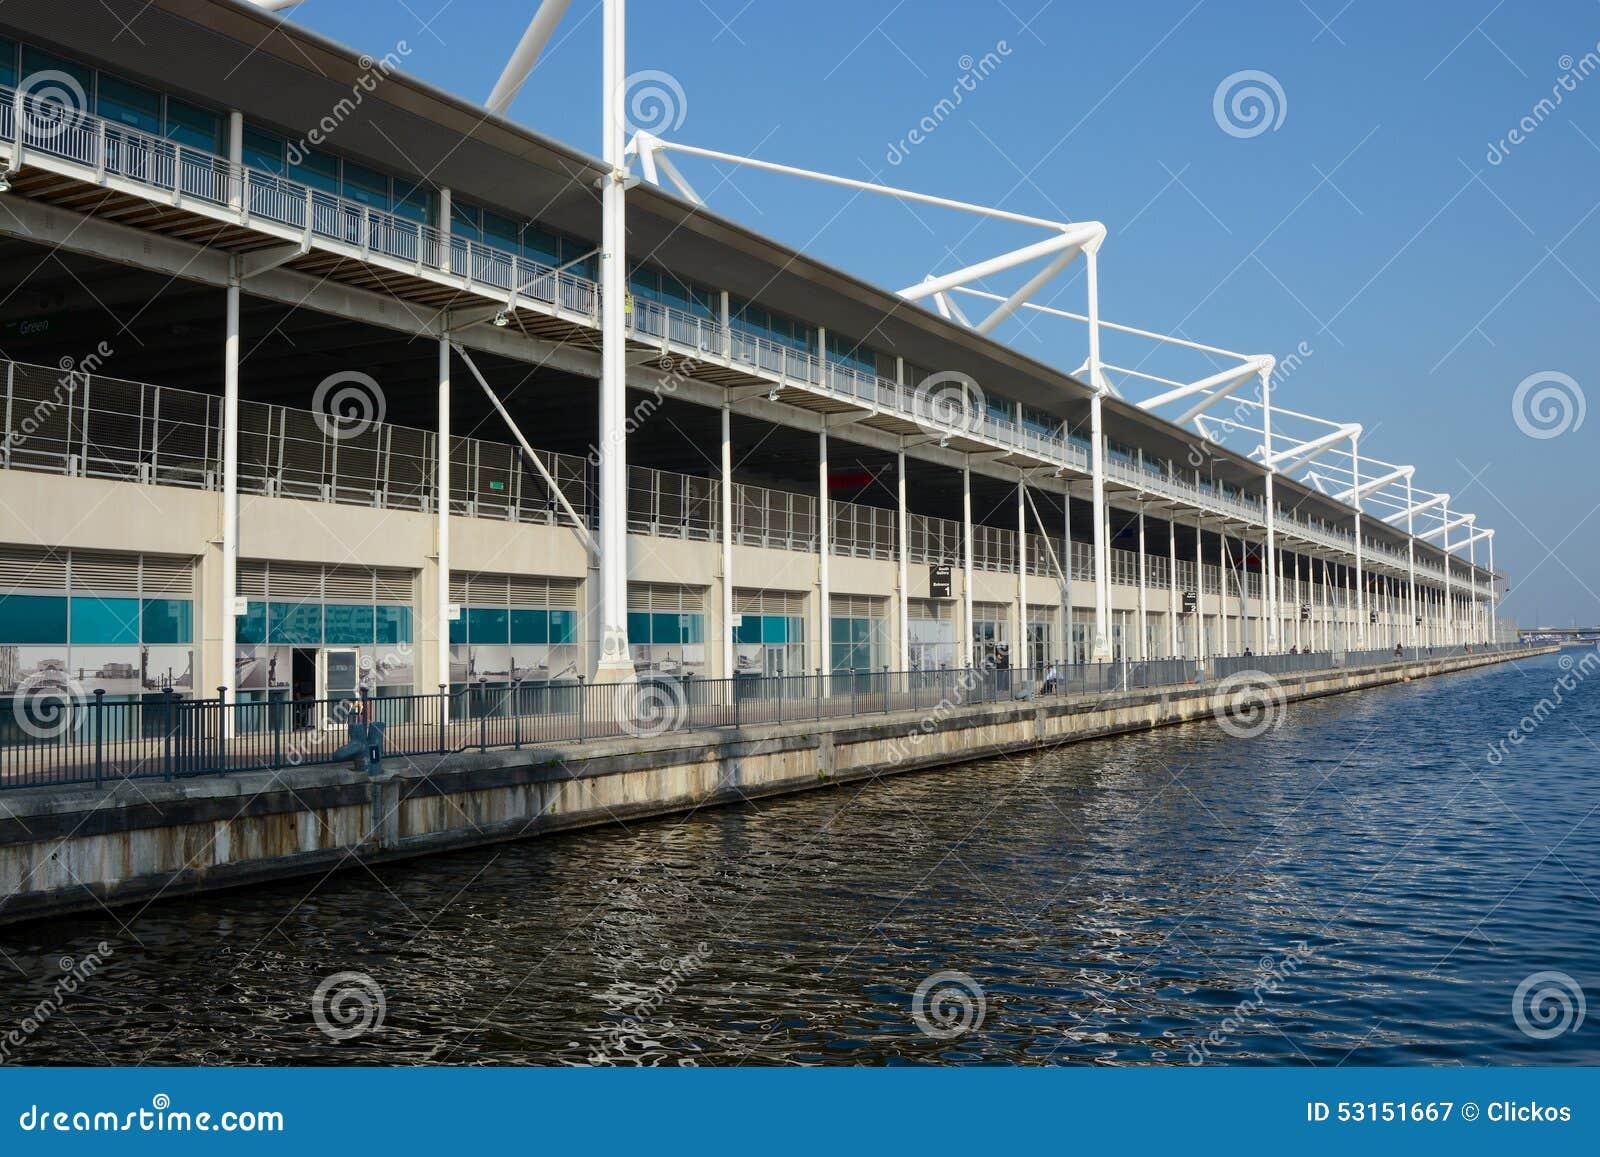 Excel Centre in Docklands, London, England